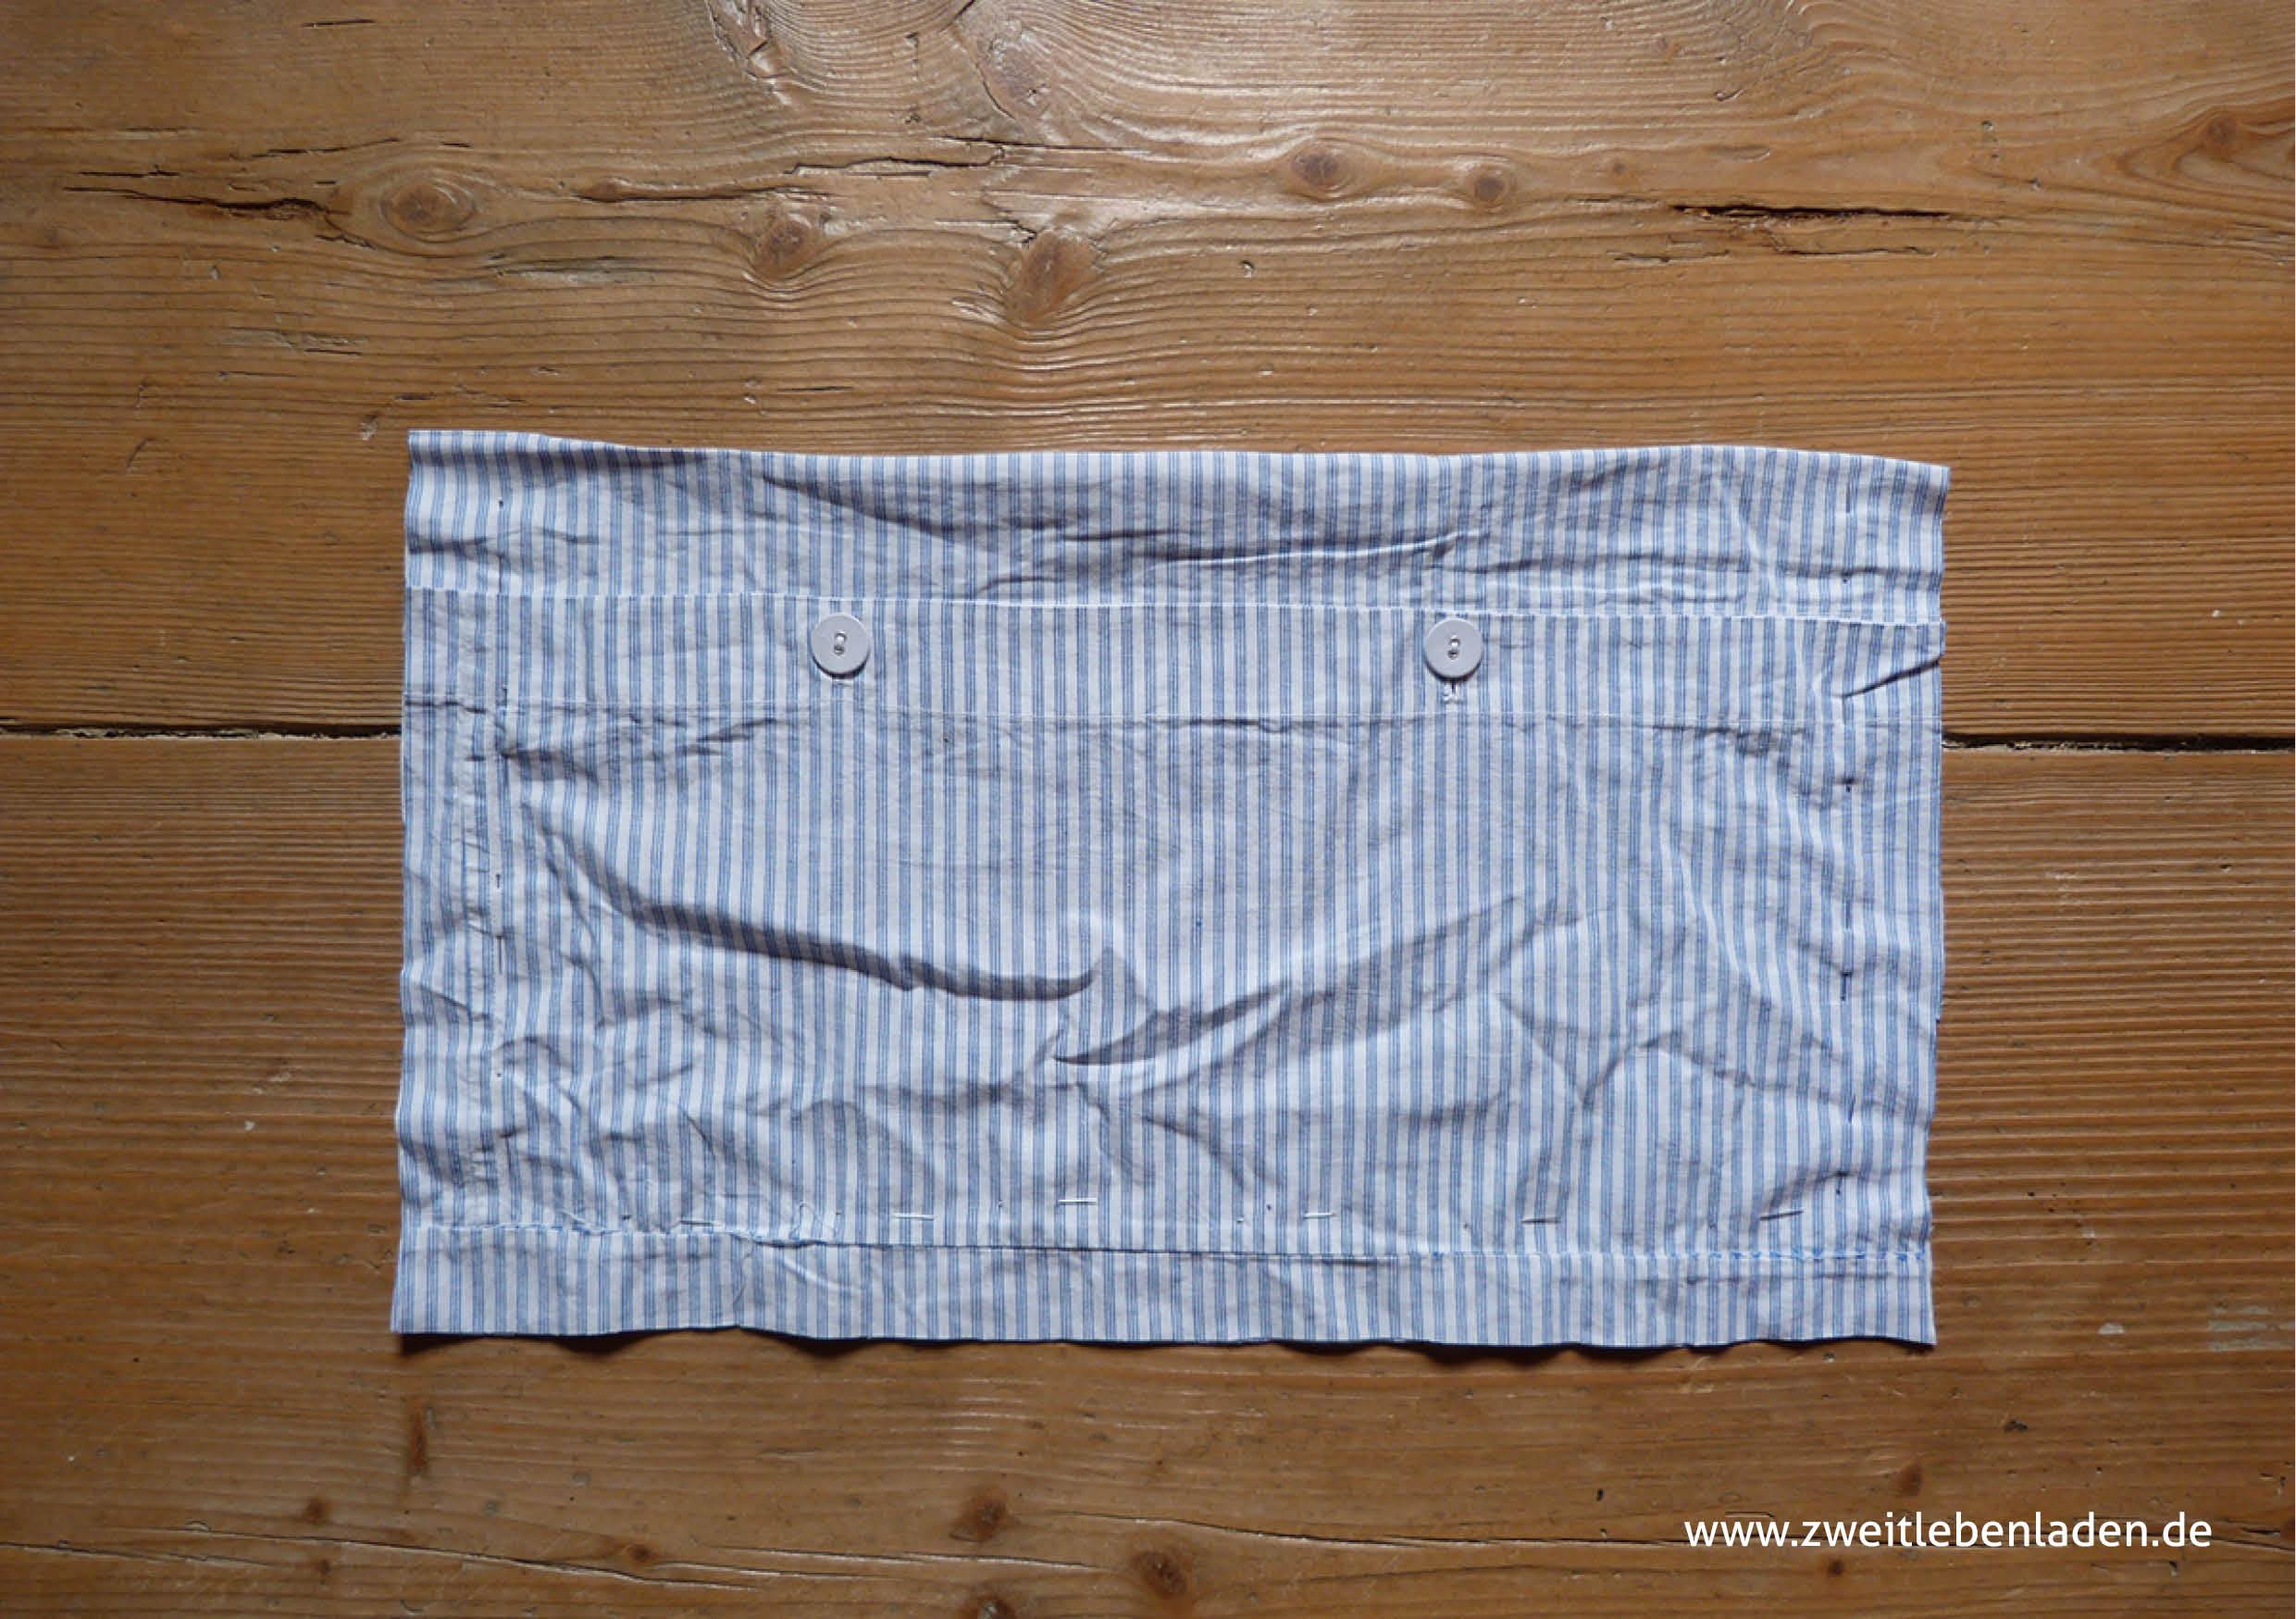 Tasche nähen - Innentasche ausgeschnitten